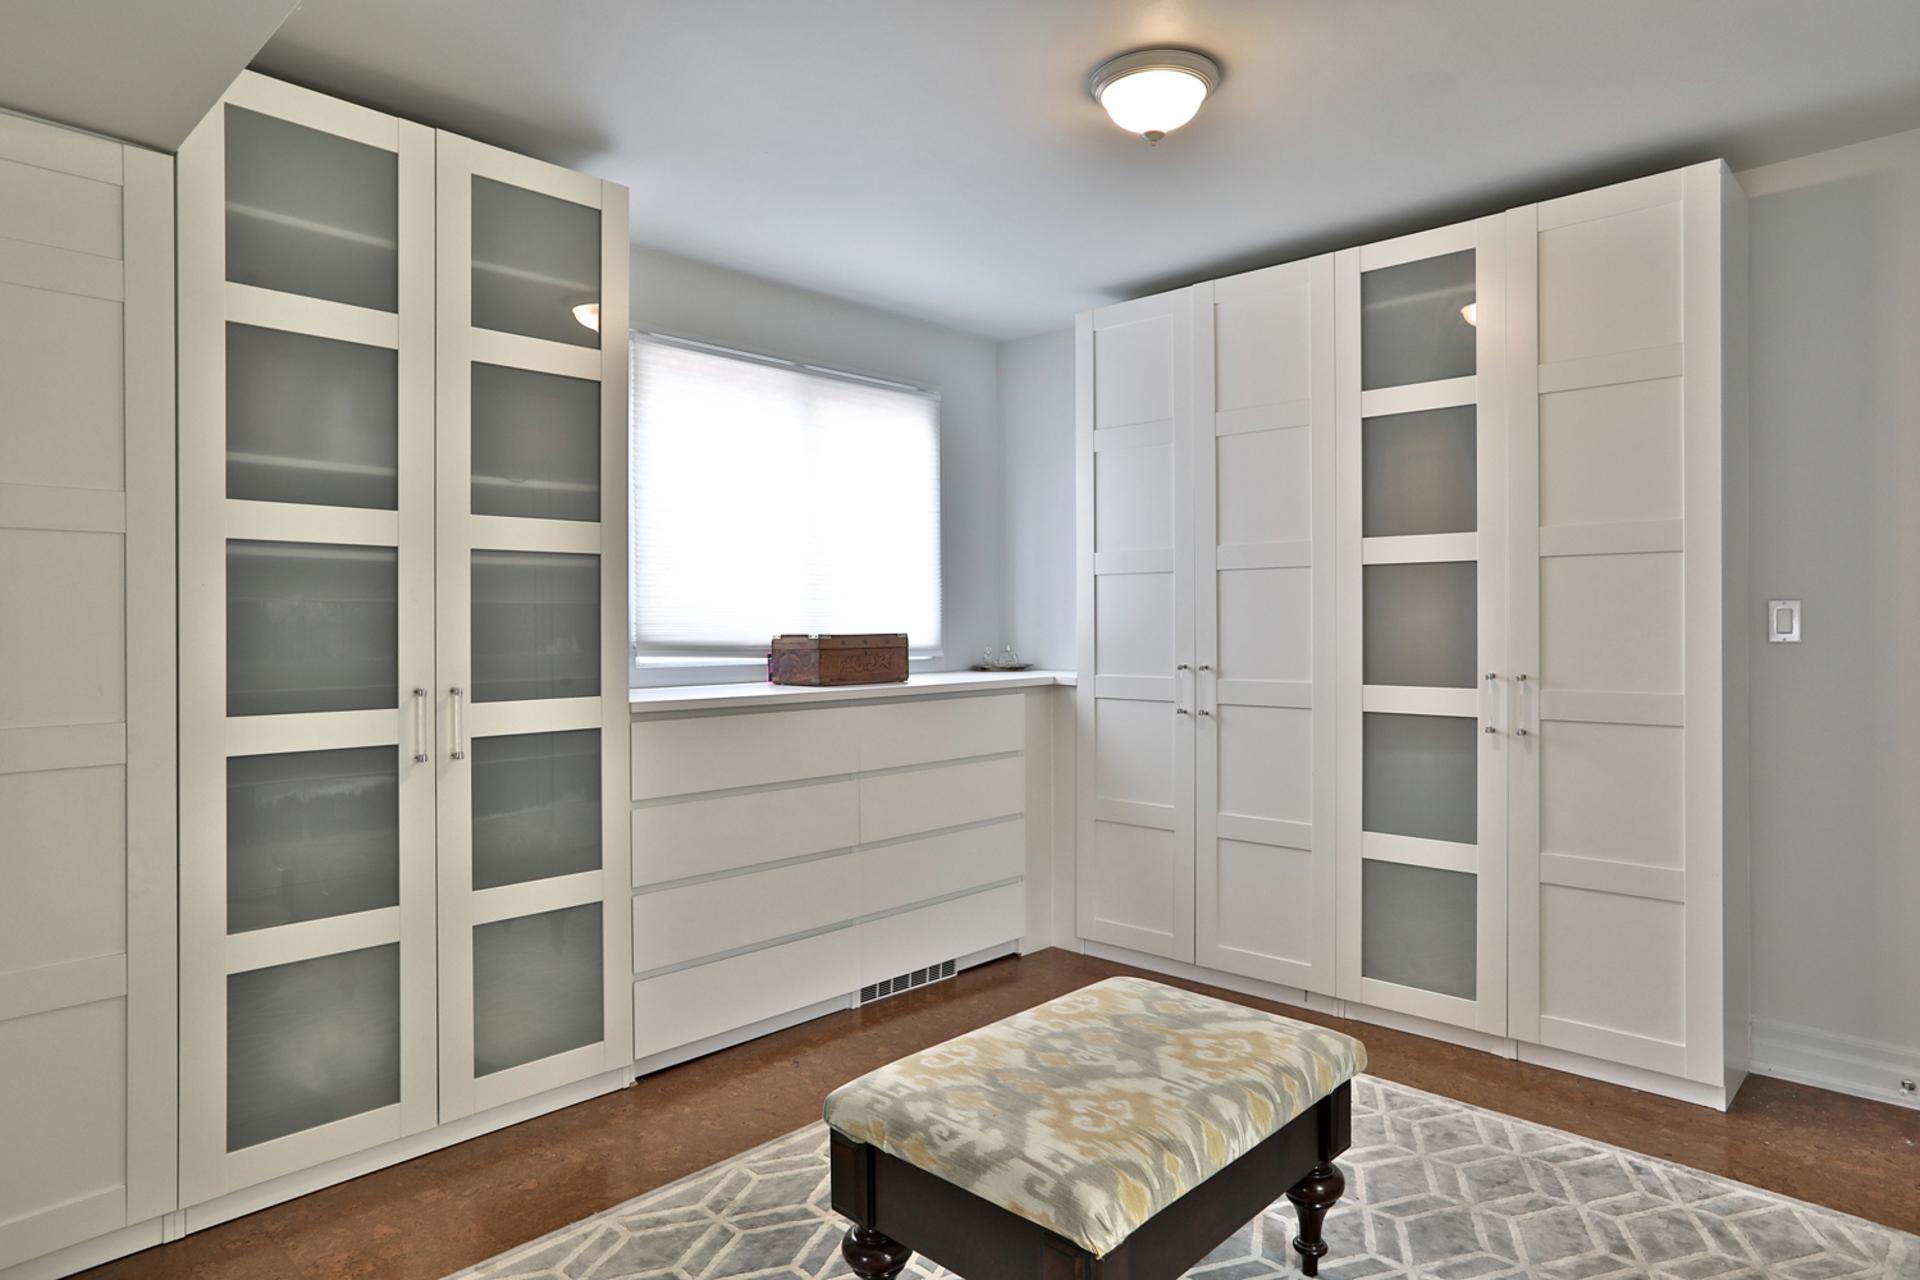 Master Bedroom Dressing Room at 32 Geraldine Court, Parkwoods-Donalda, Toronto